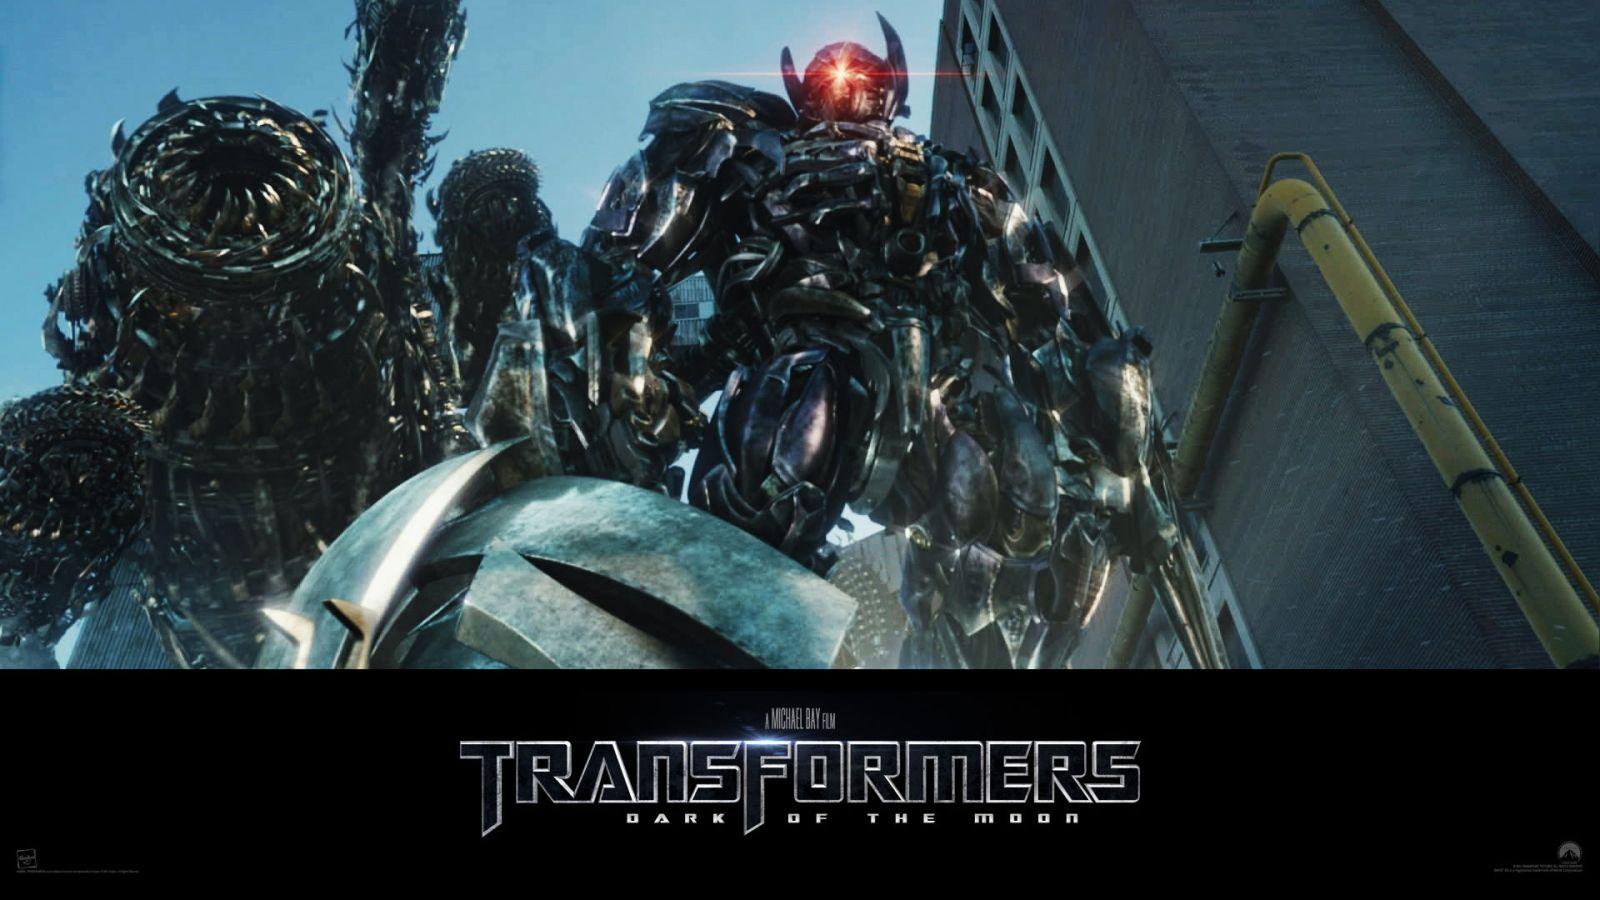 Transformers Dark of the Moon wallpaper 8